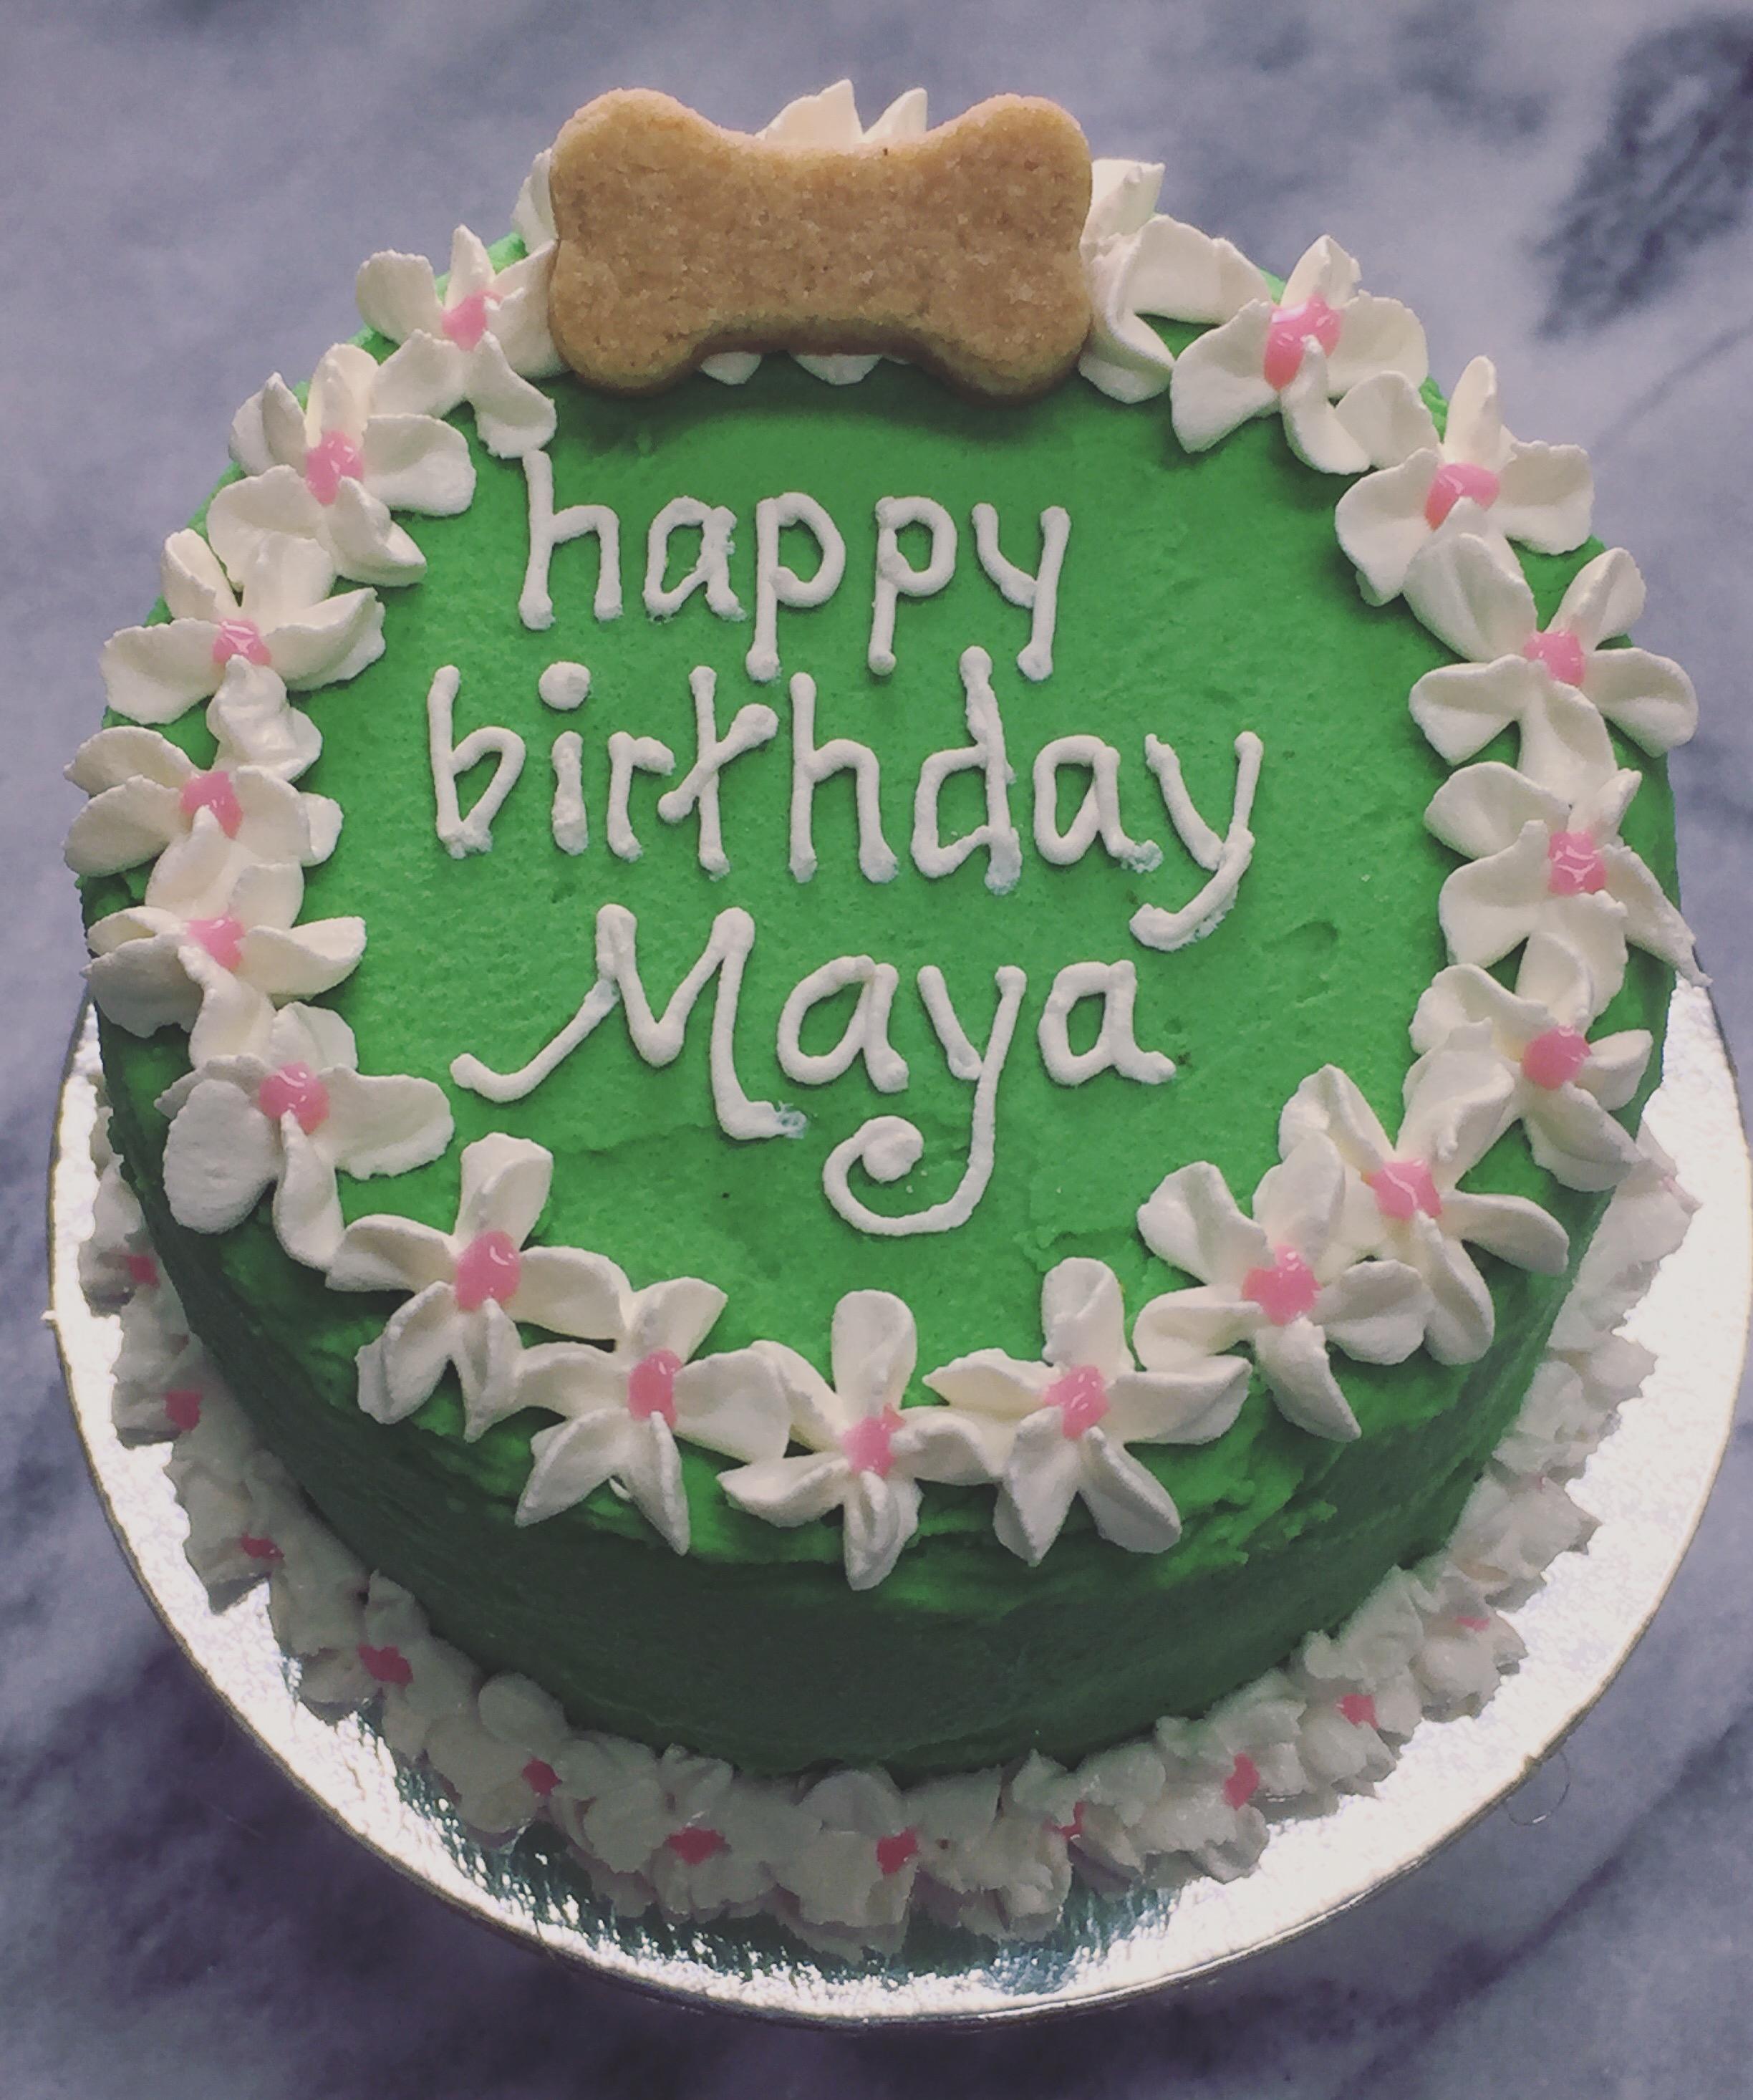 Maya's cake.jpg